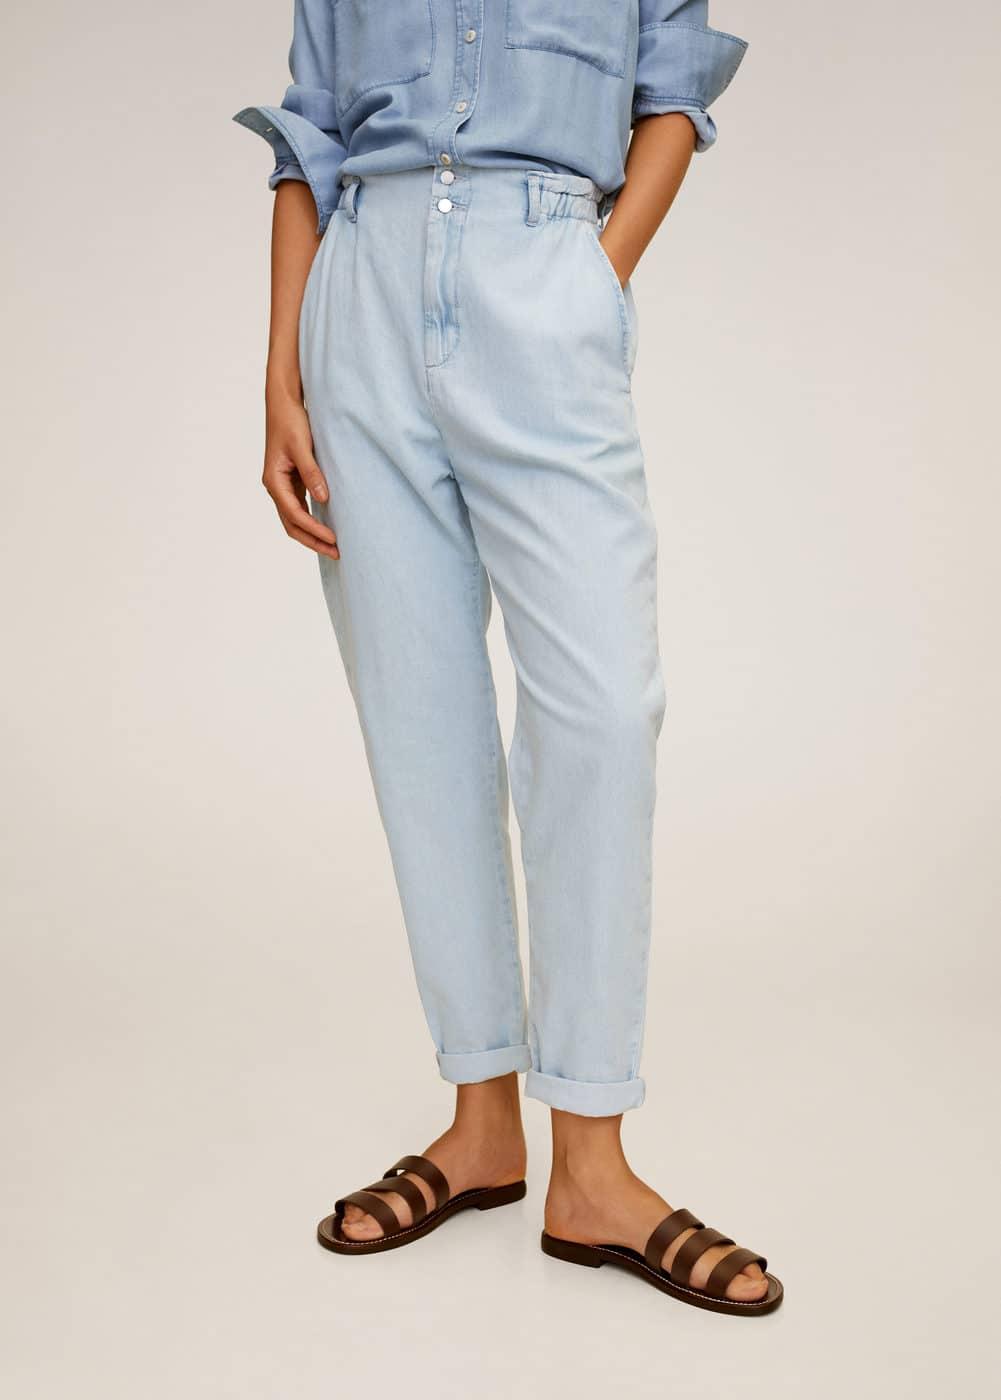 m-patricia:jeans slouchy cintura elastica